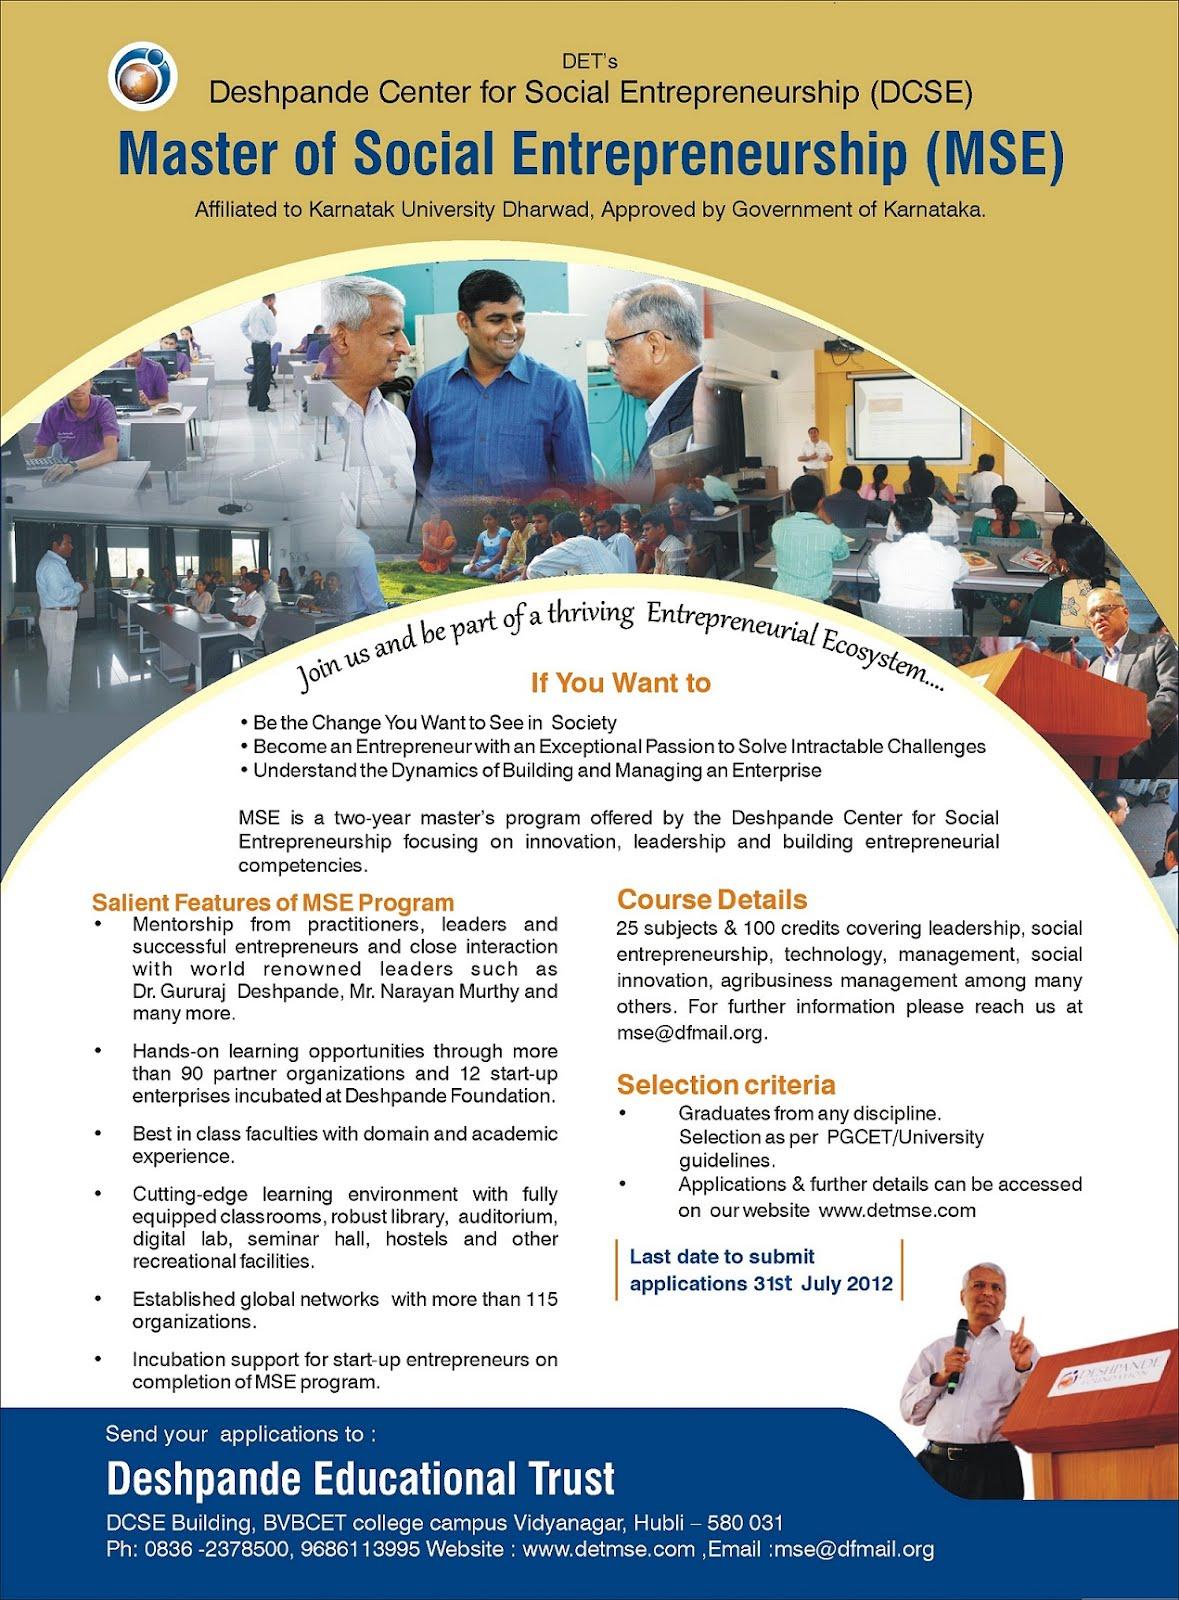 social entrepreneurship in india School for social entrepreneurs india (sse india) supports people who have an idea for a social enterprise or social impact project in india.